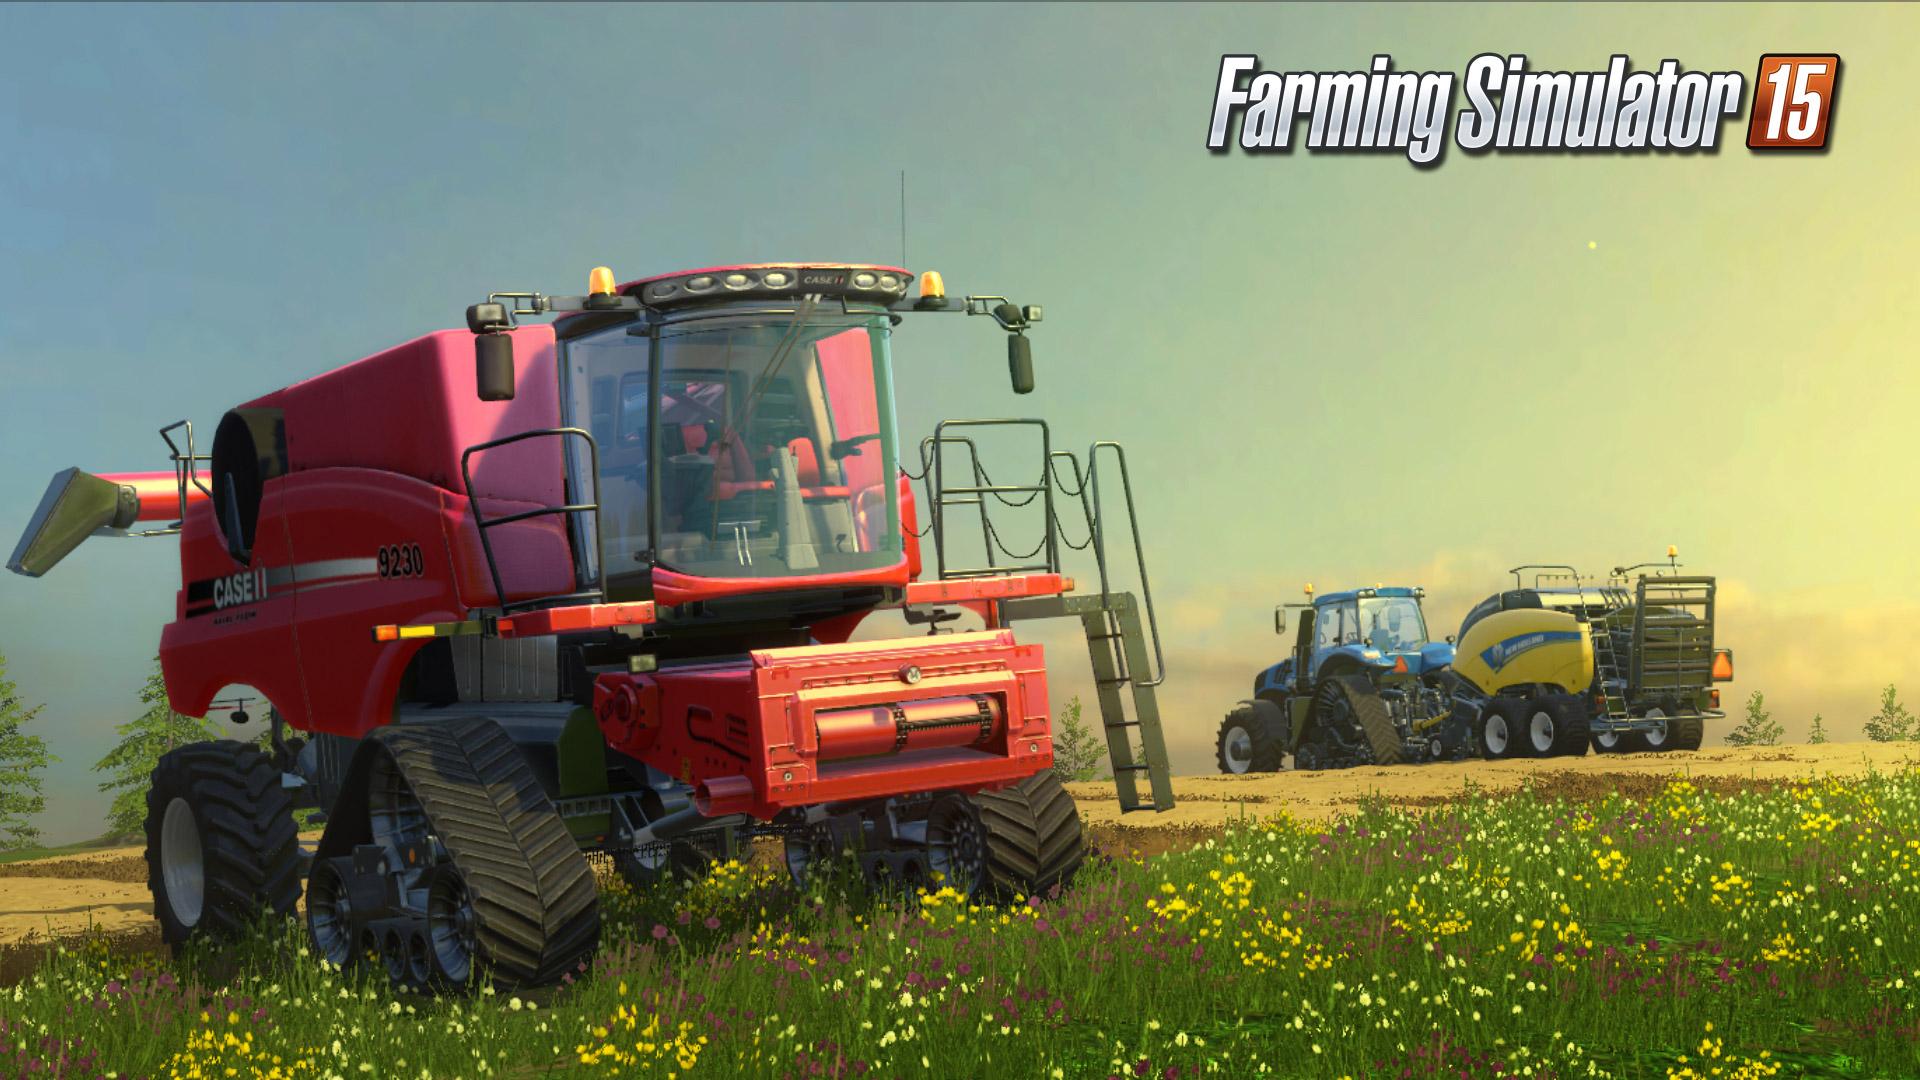 Farming Simulator 15 brings serious farm simulation to consoles in May